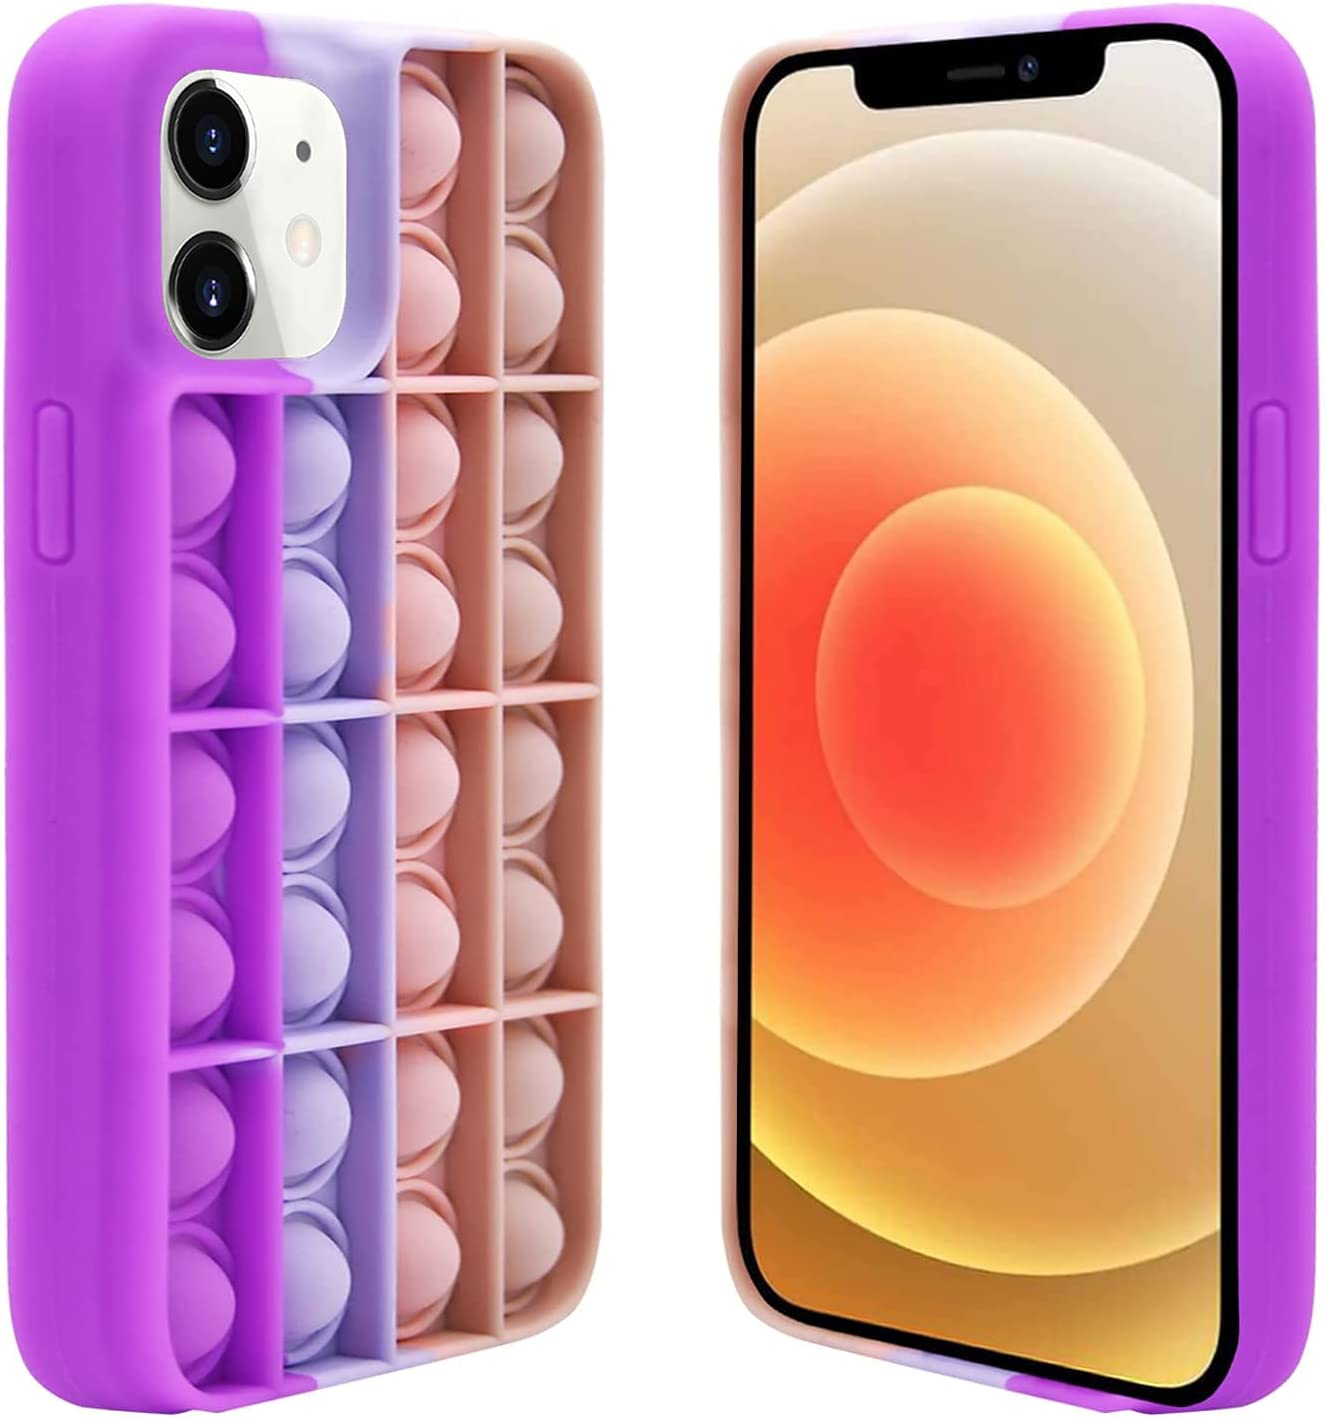 VUIIMEEK Push Sensory Fidget Case for iPhone 11 6.1